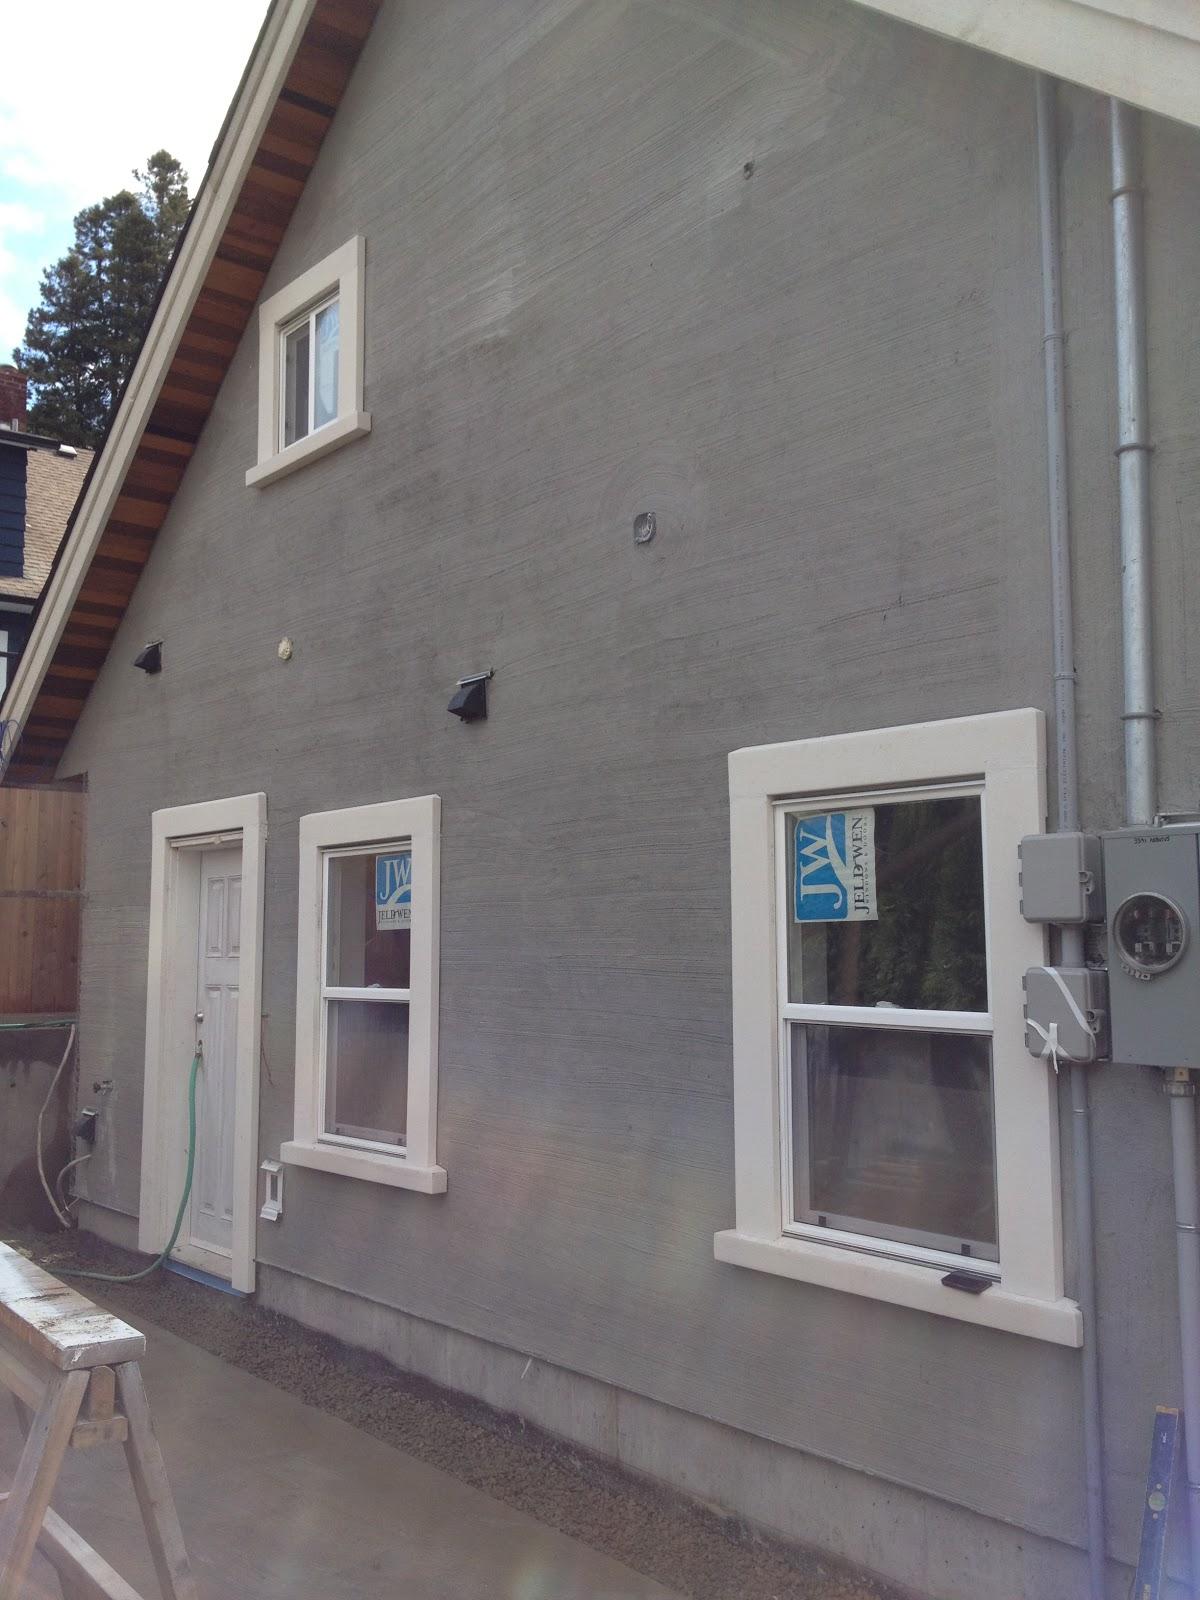 Front Entrance Doors also Craftsman Bungalow besides PED169264 Elliptical Sunburst With Trim Pediment likewise 218143175673040625 further Traditional. on craftsman exterior trim details